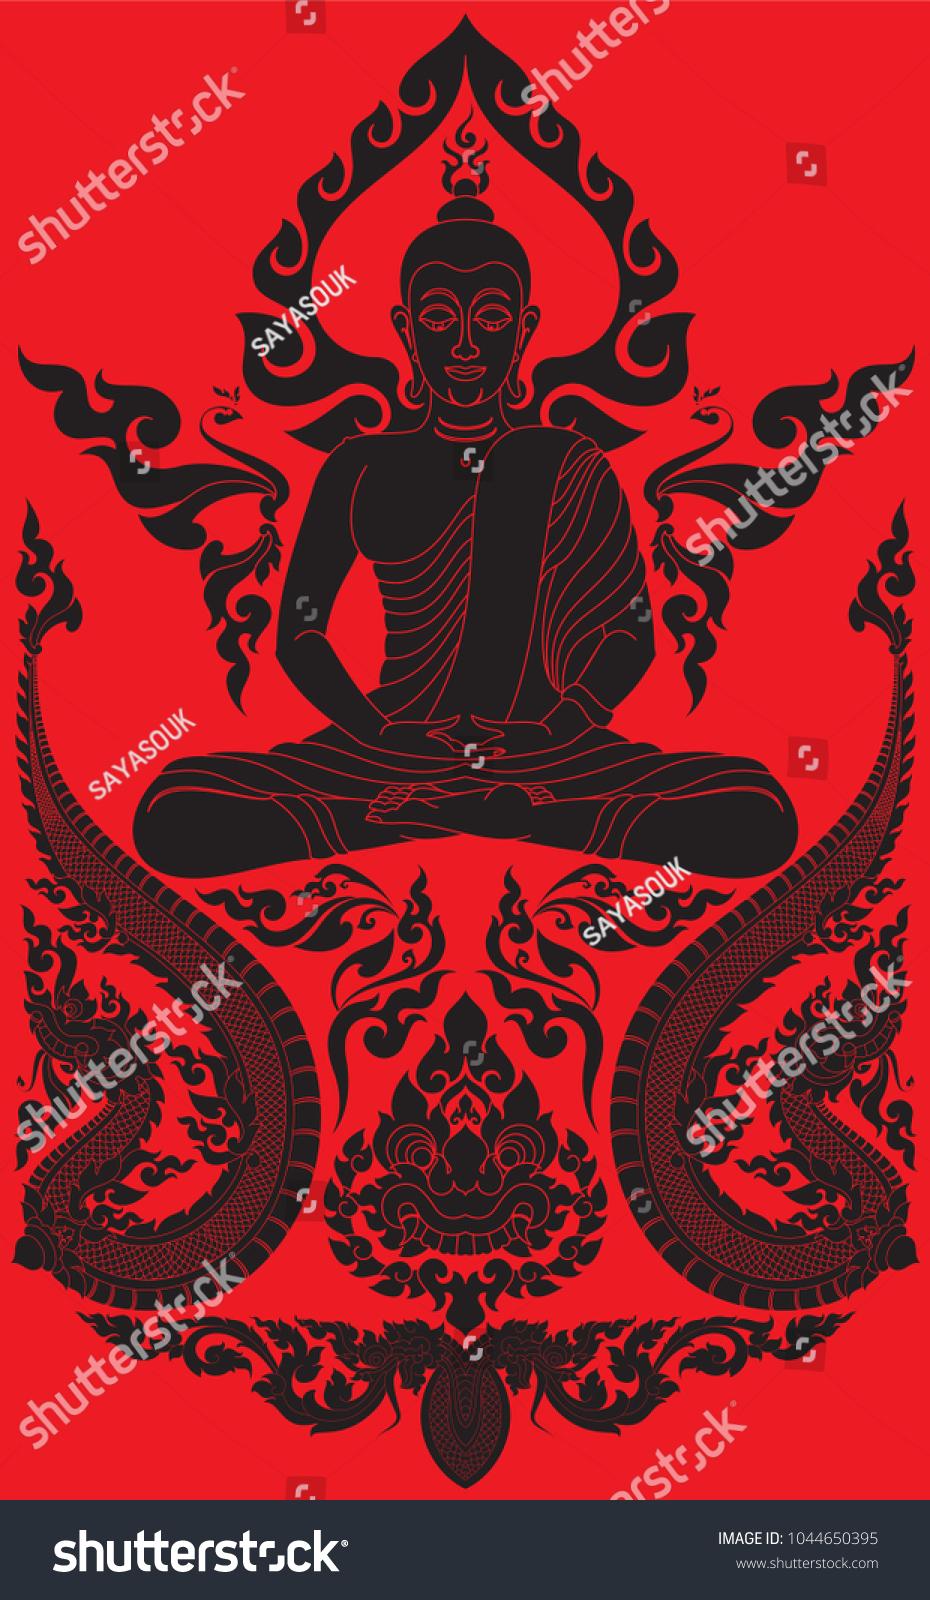 Buddha Meditation Swirl Doodle Bodhi Leaf Image Vectorielle De Stock